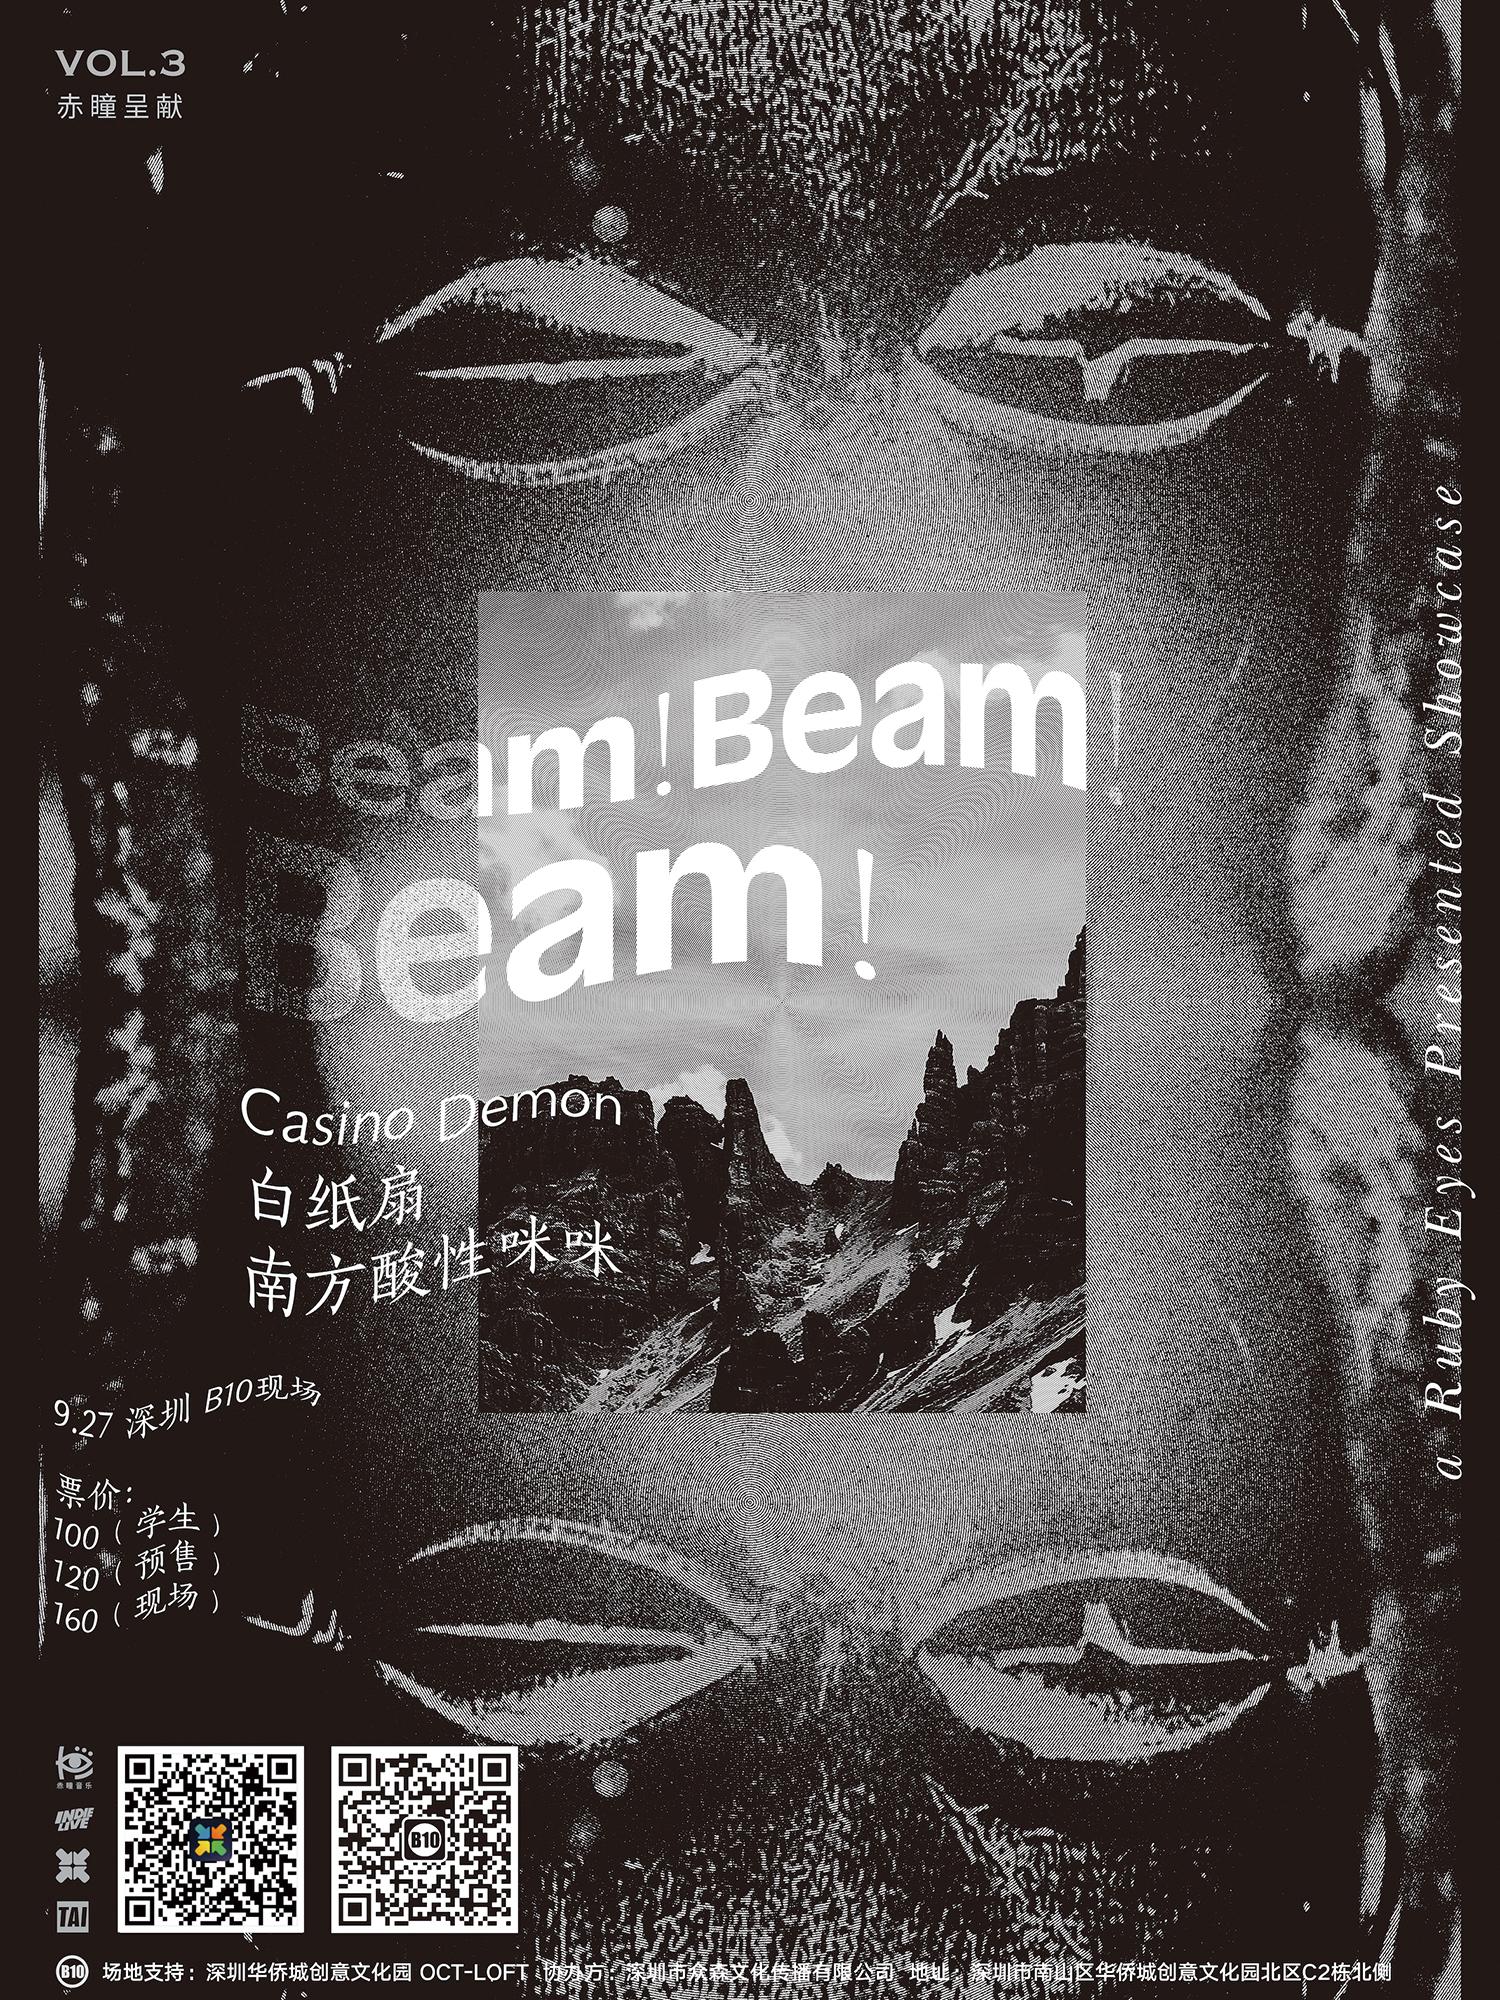 【海报】0927 Beam!Beam!Beam! 小.jpg